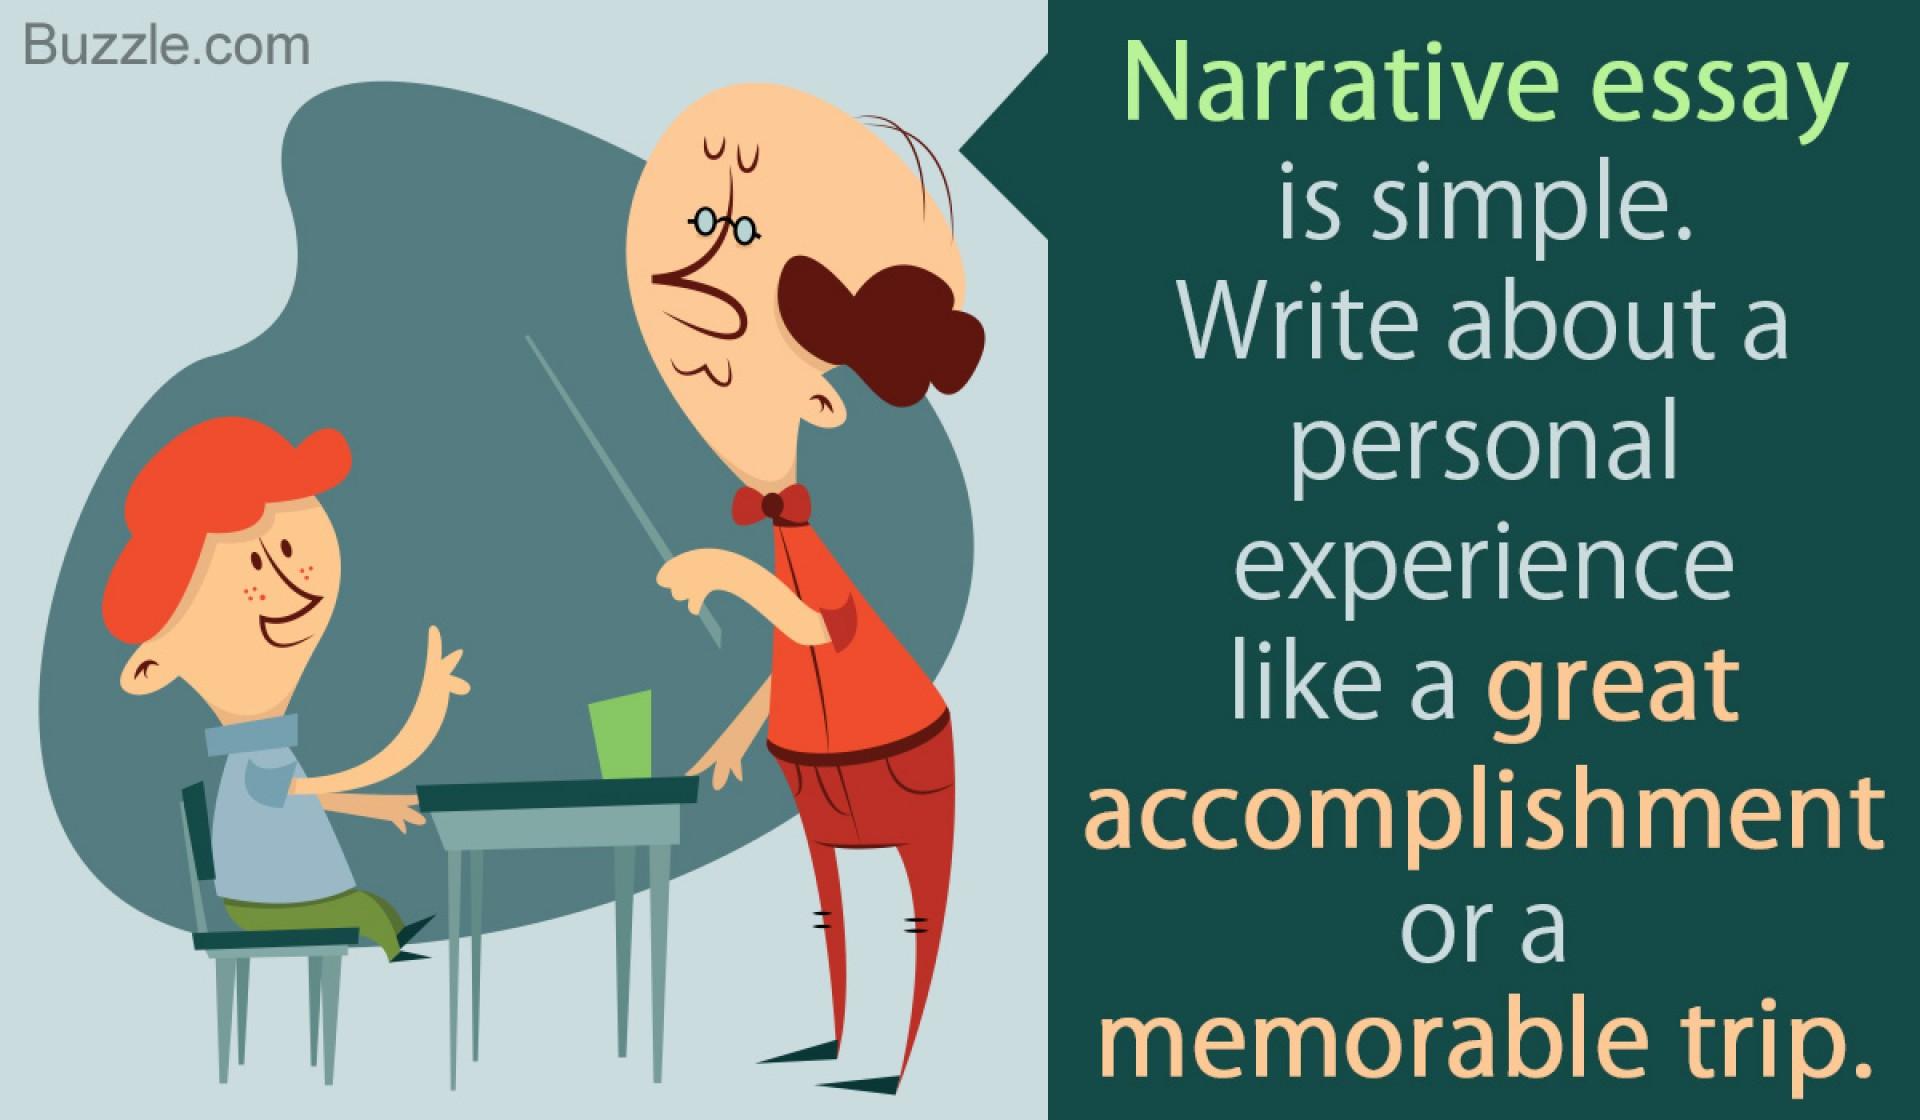 006 Ideas For Narrative Essay Beautiful A Fictional Writing Personal Descriptive 1920